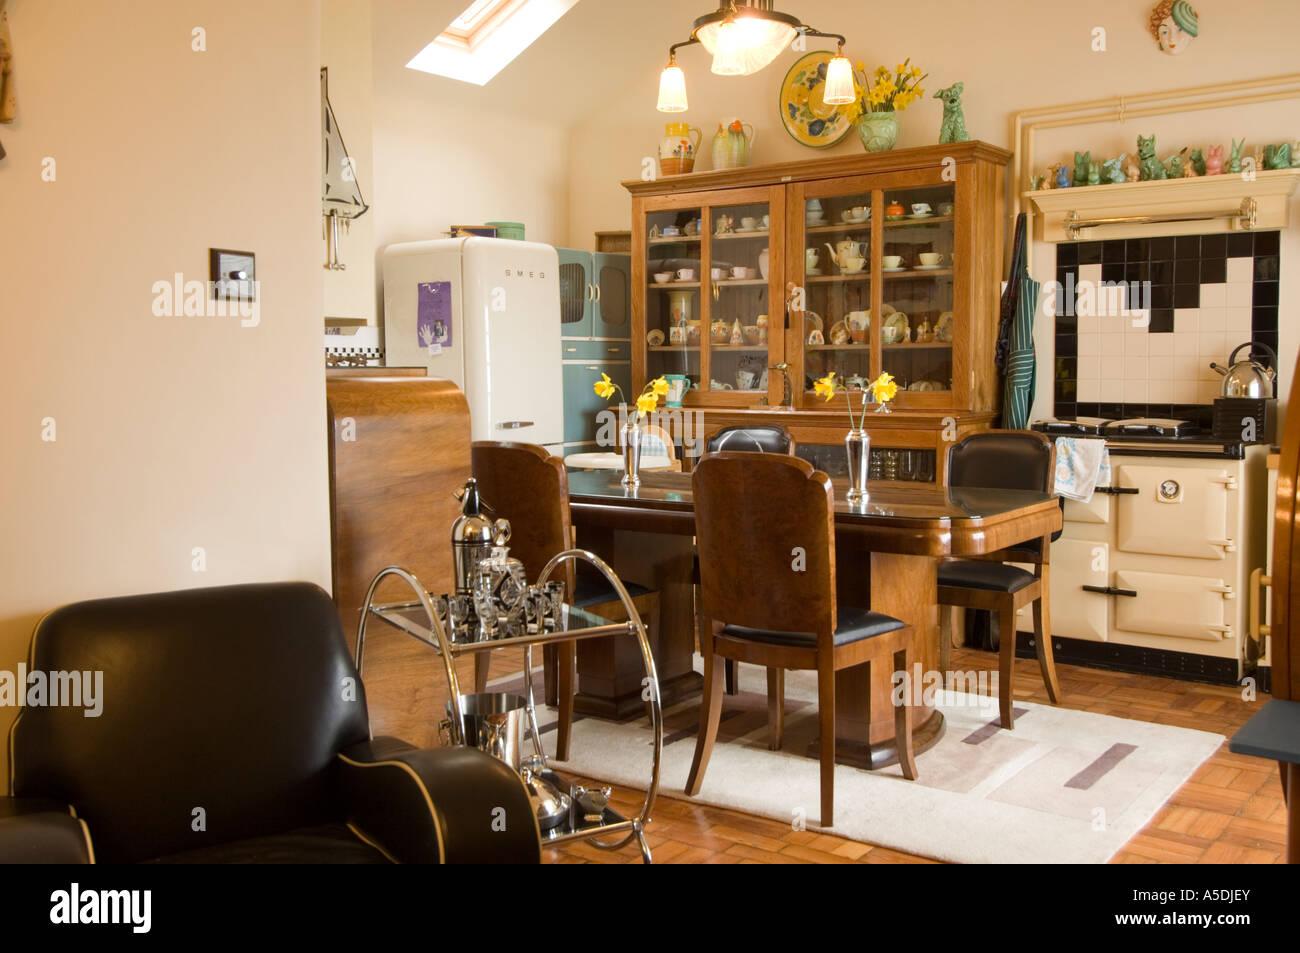 Refurbished art deco s house interior kitchen and lounge